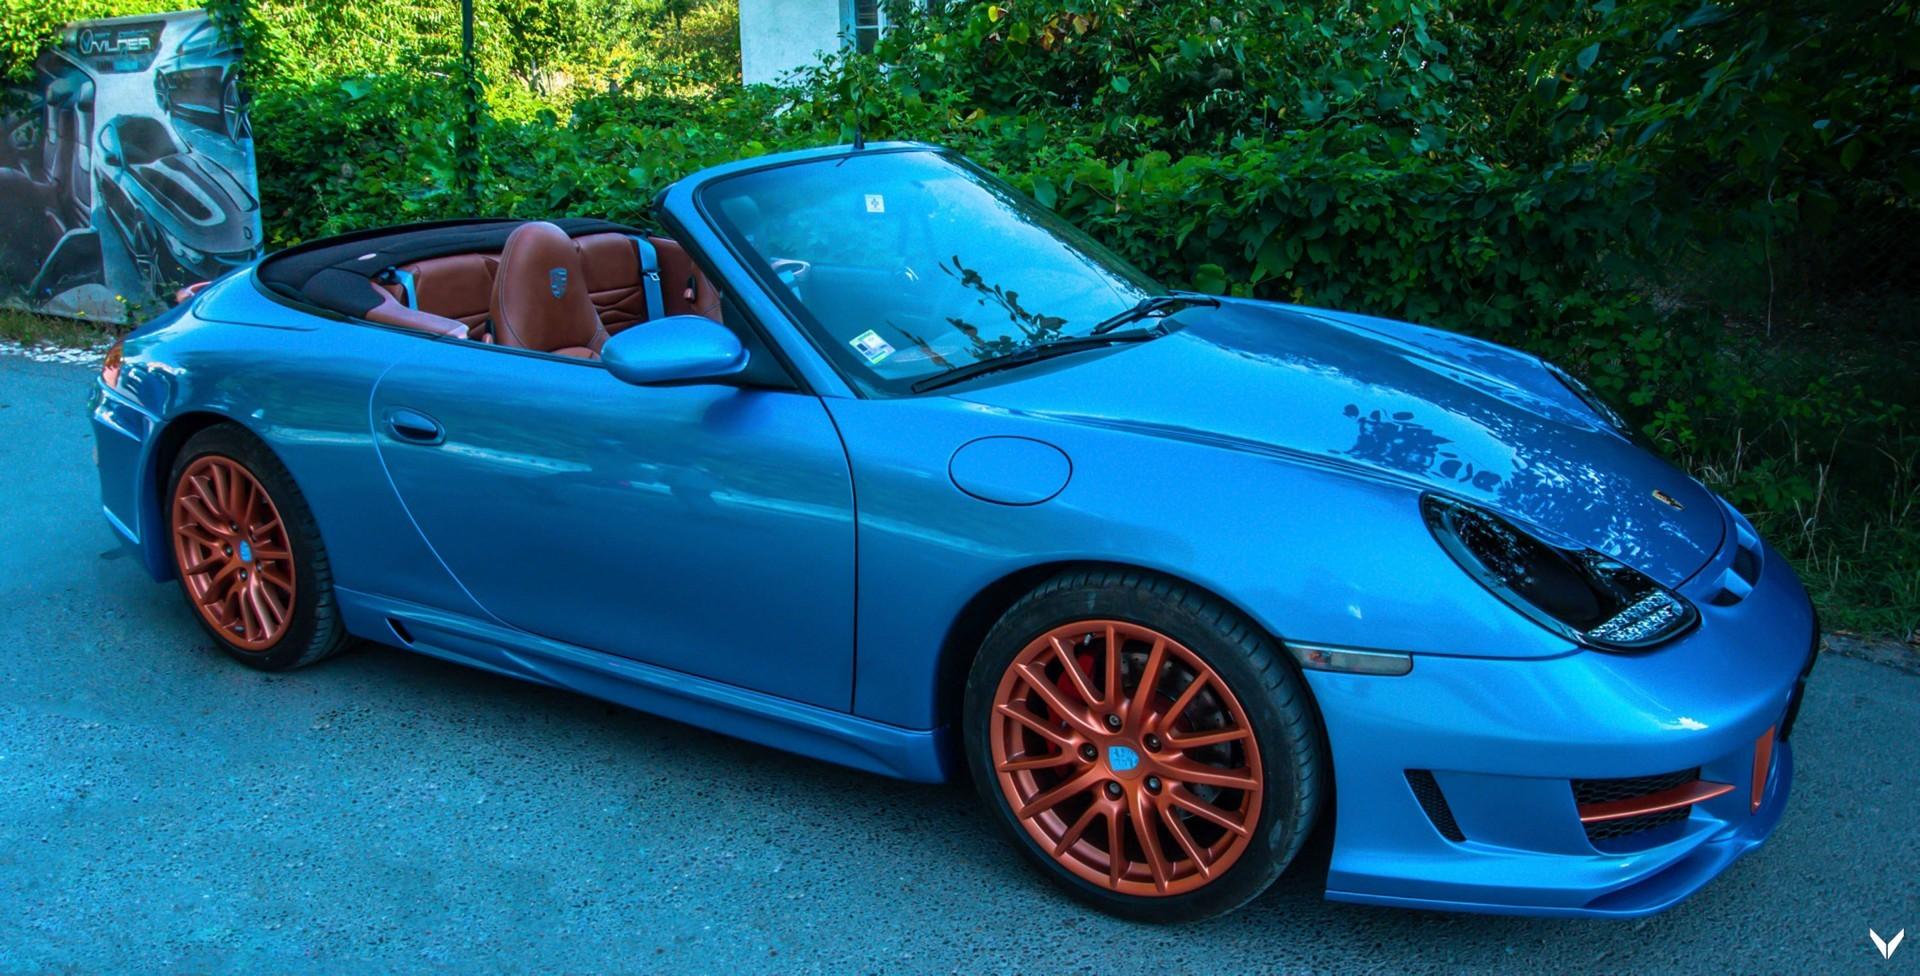 Vilner Porsche 911 Carrera Cabriolet 2020